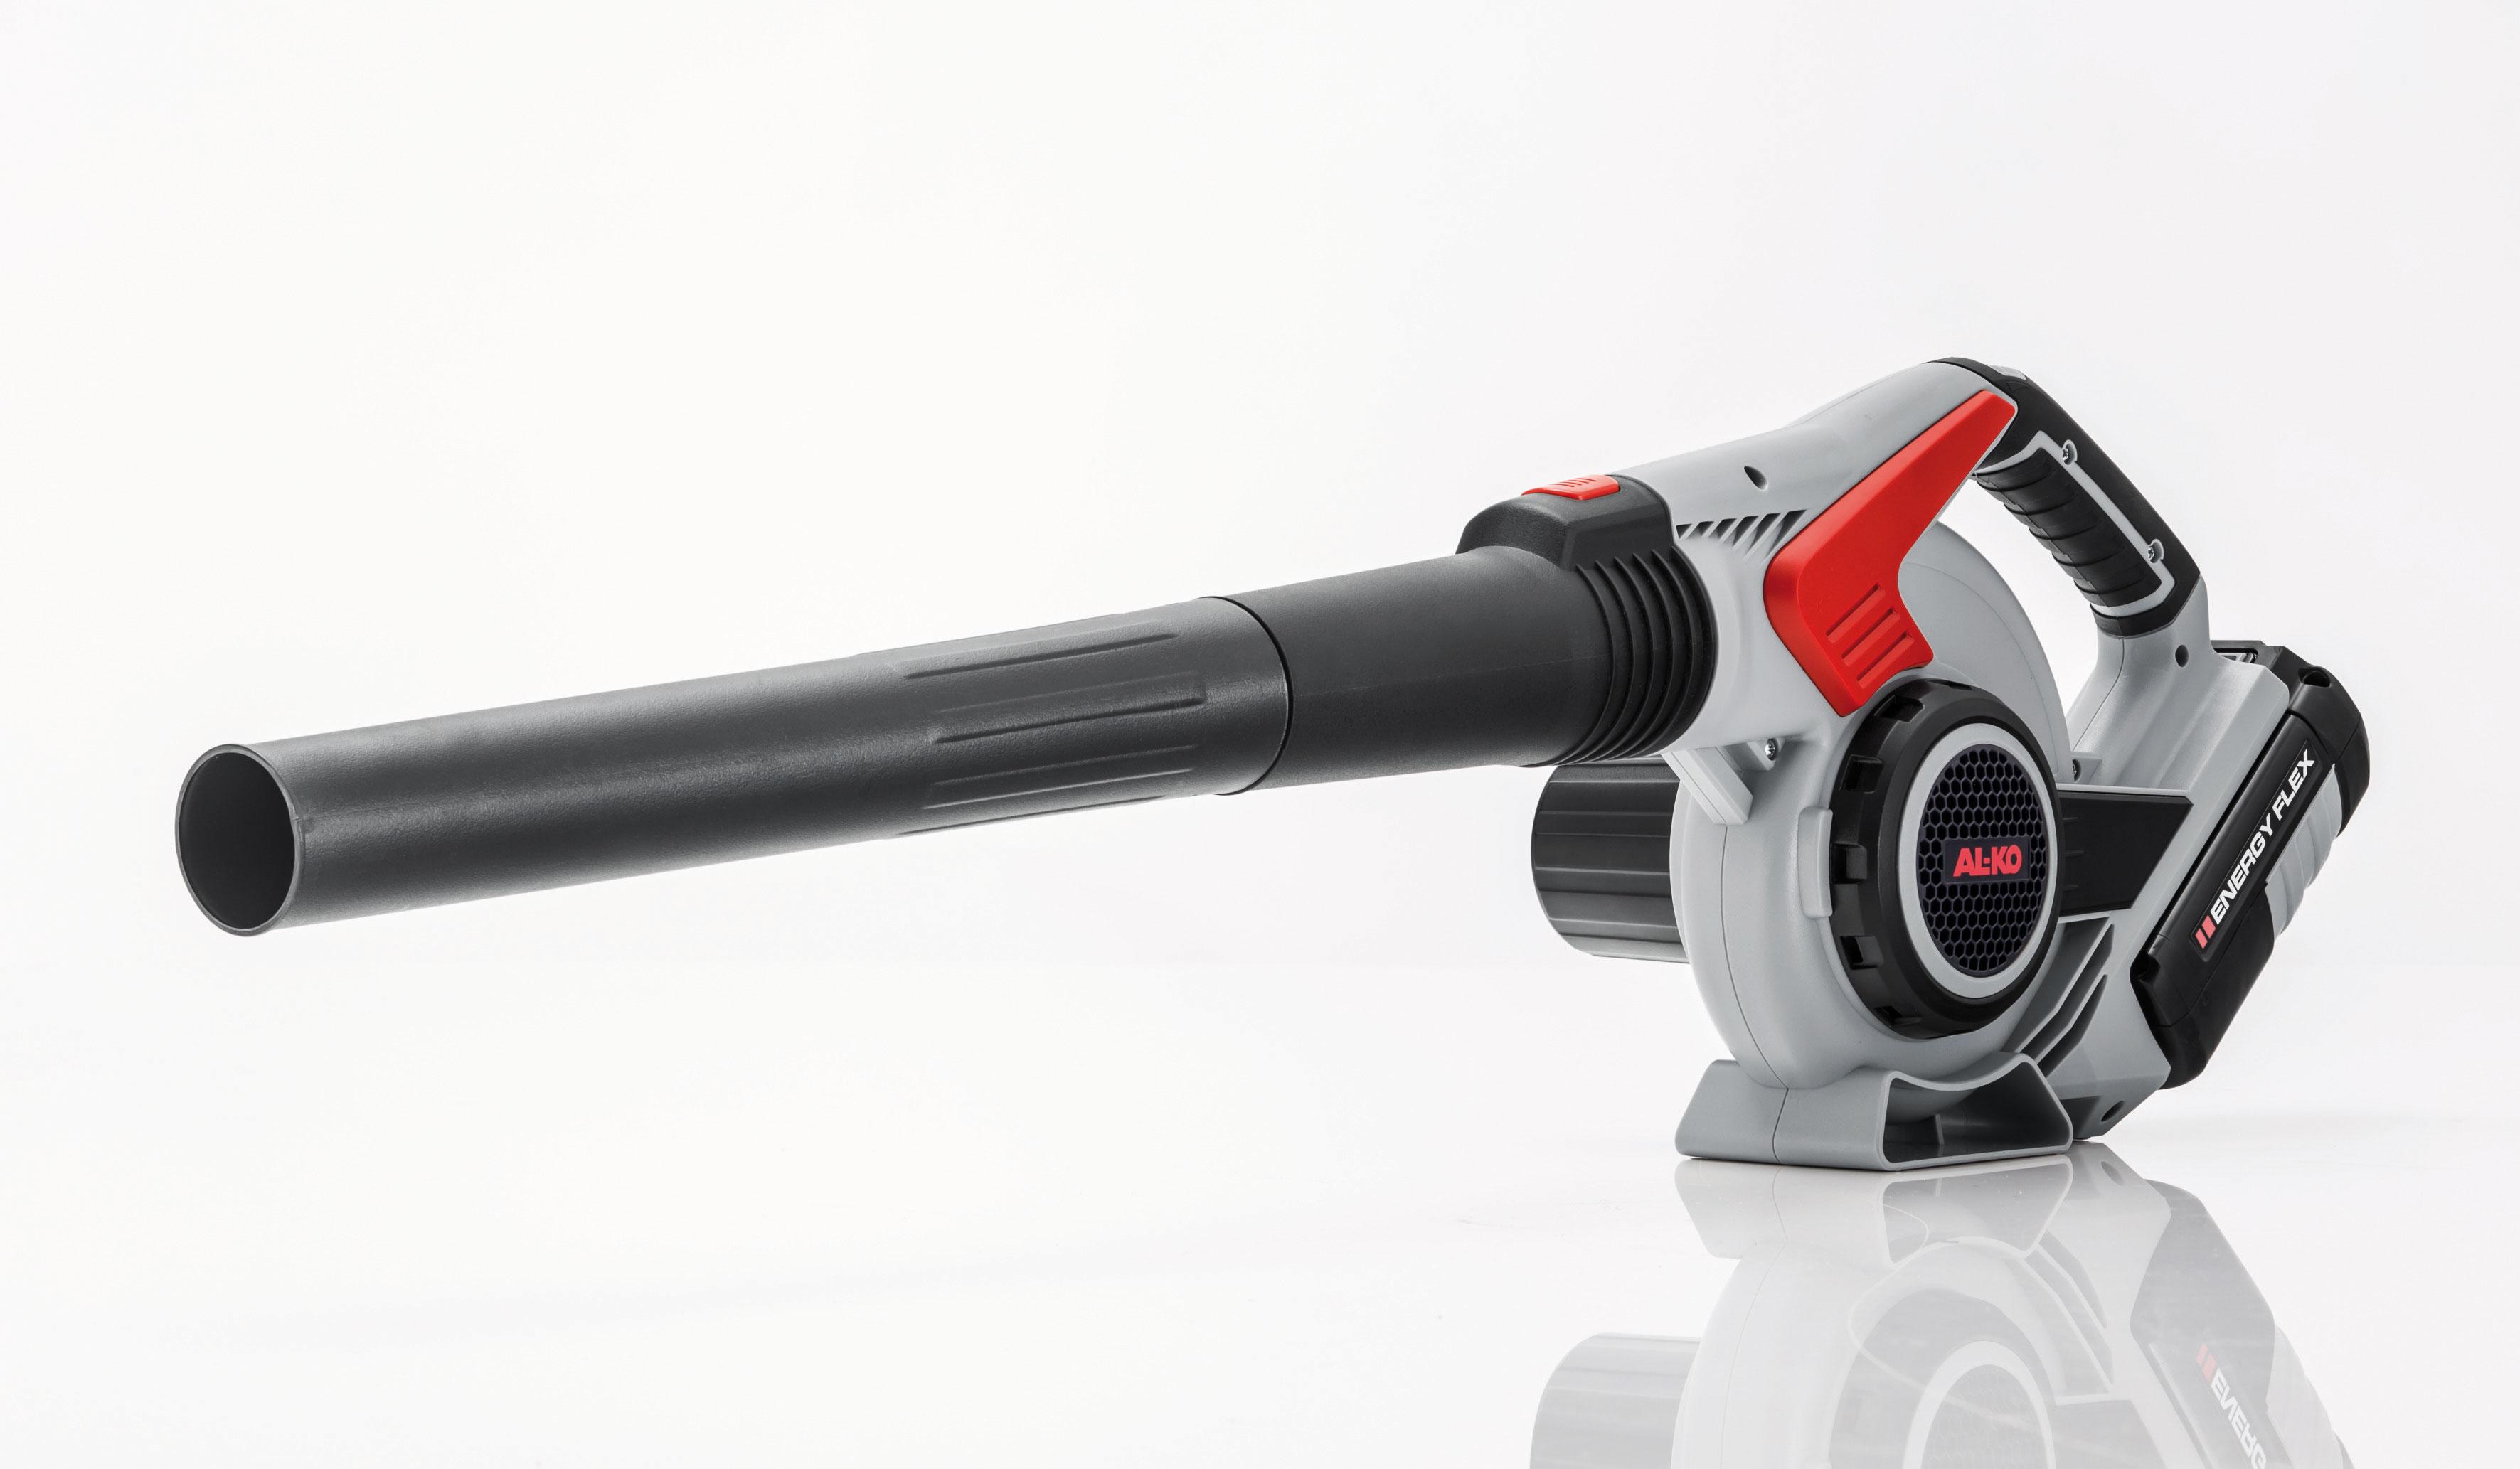 AL-KO Akku-Laubbläser EnergyFlex LB 4060 ohne Akku 330m³/h Bild 1